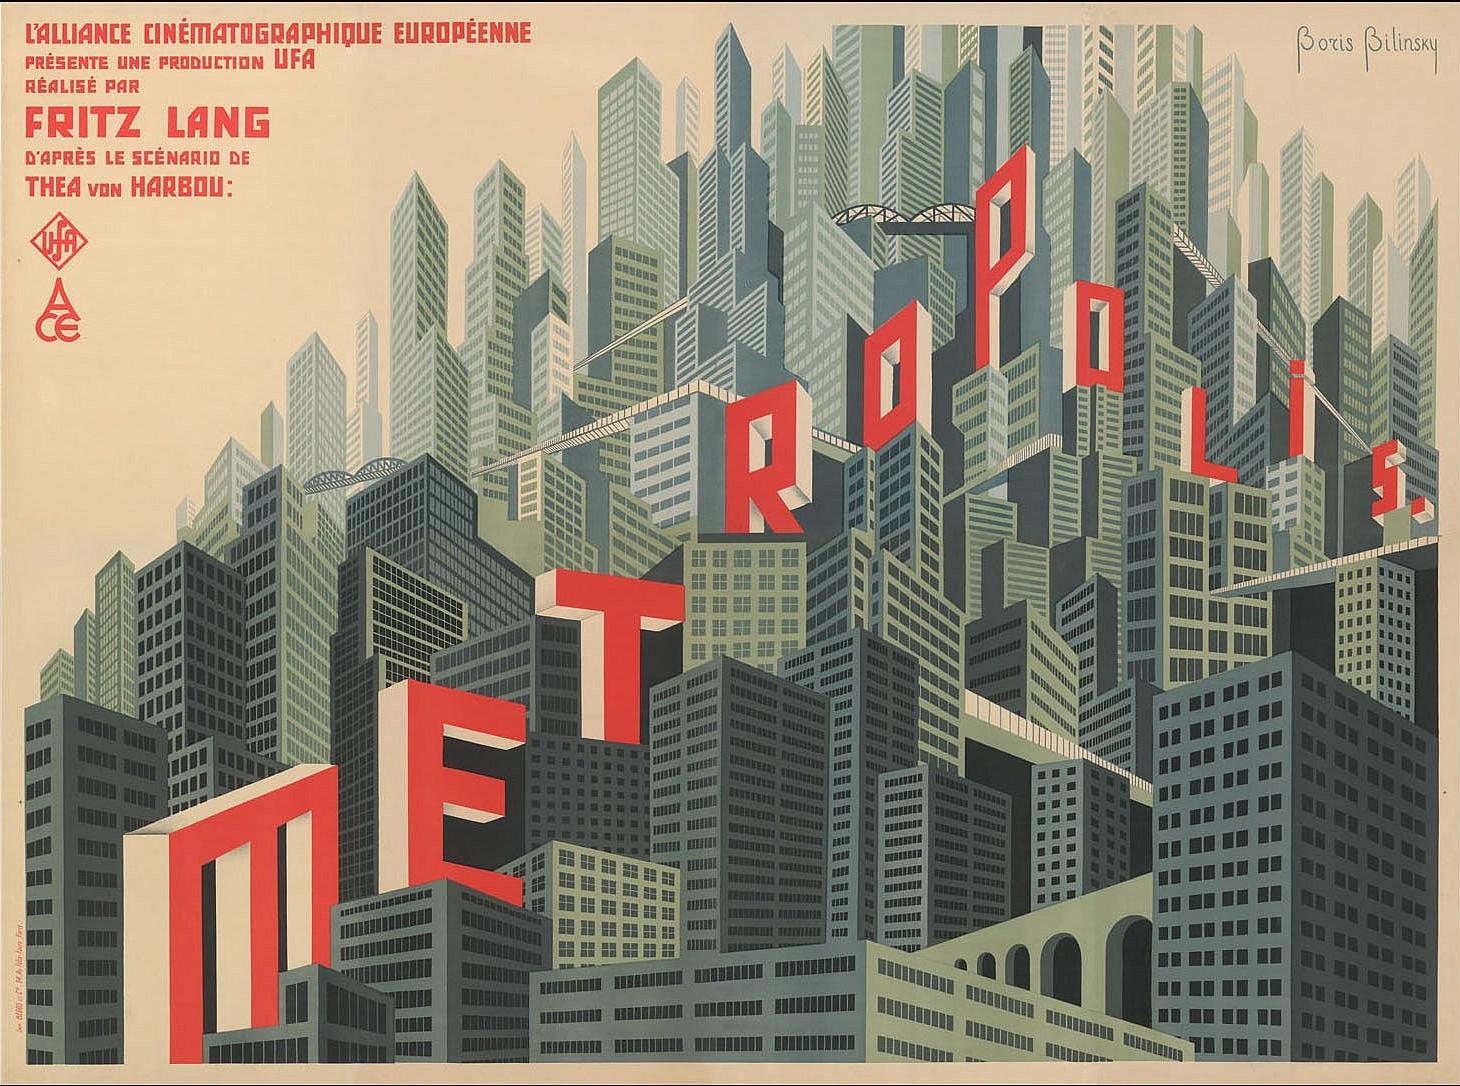 Votre dernier film visionné - Page 4 1927_Boris_Bilinski_%281900-1948%29_Plakat_f%C3%BCr_den_Film_Metropolis%2C_Staatliche_Museen_zu_Berlin